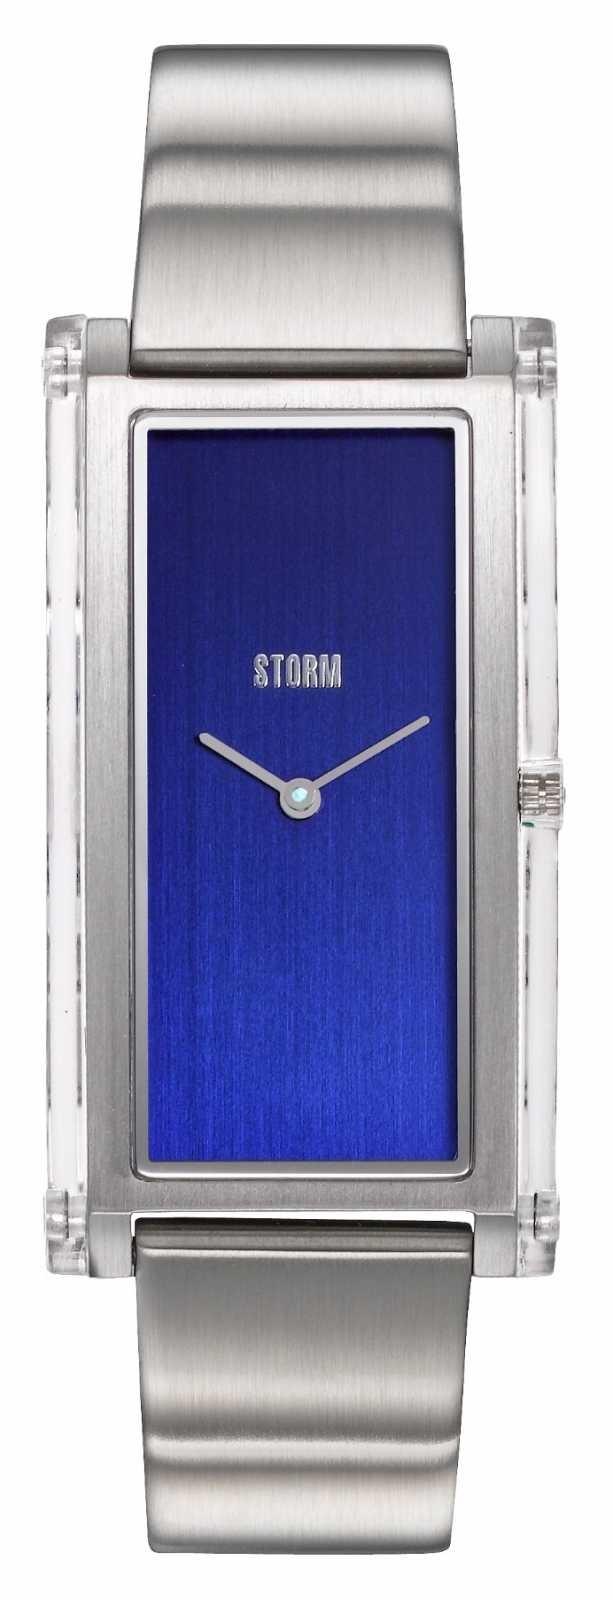 STORM   Plexia Blue   Stainless Steel Bracelet   Blue Dial   47450/B